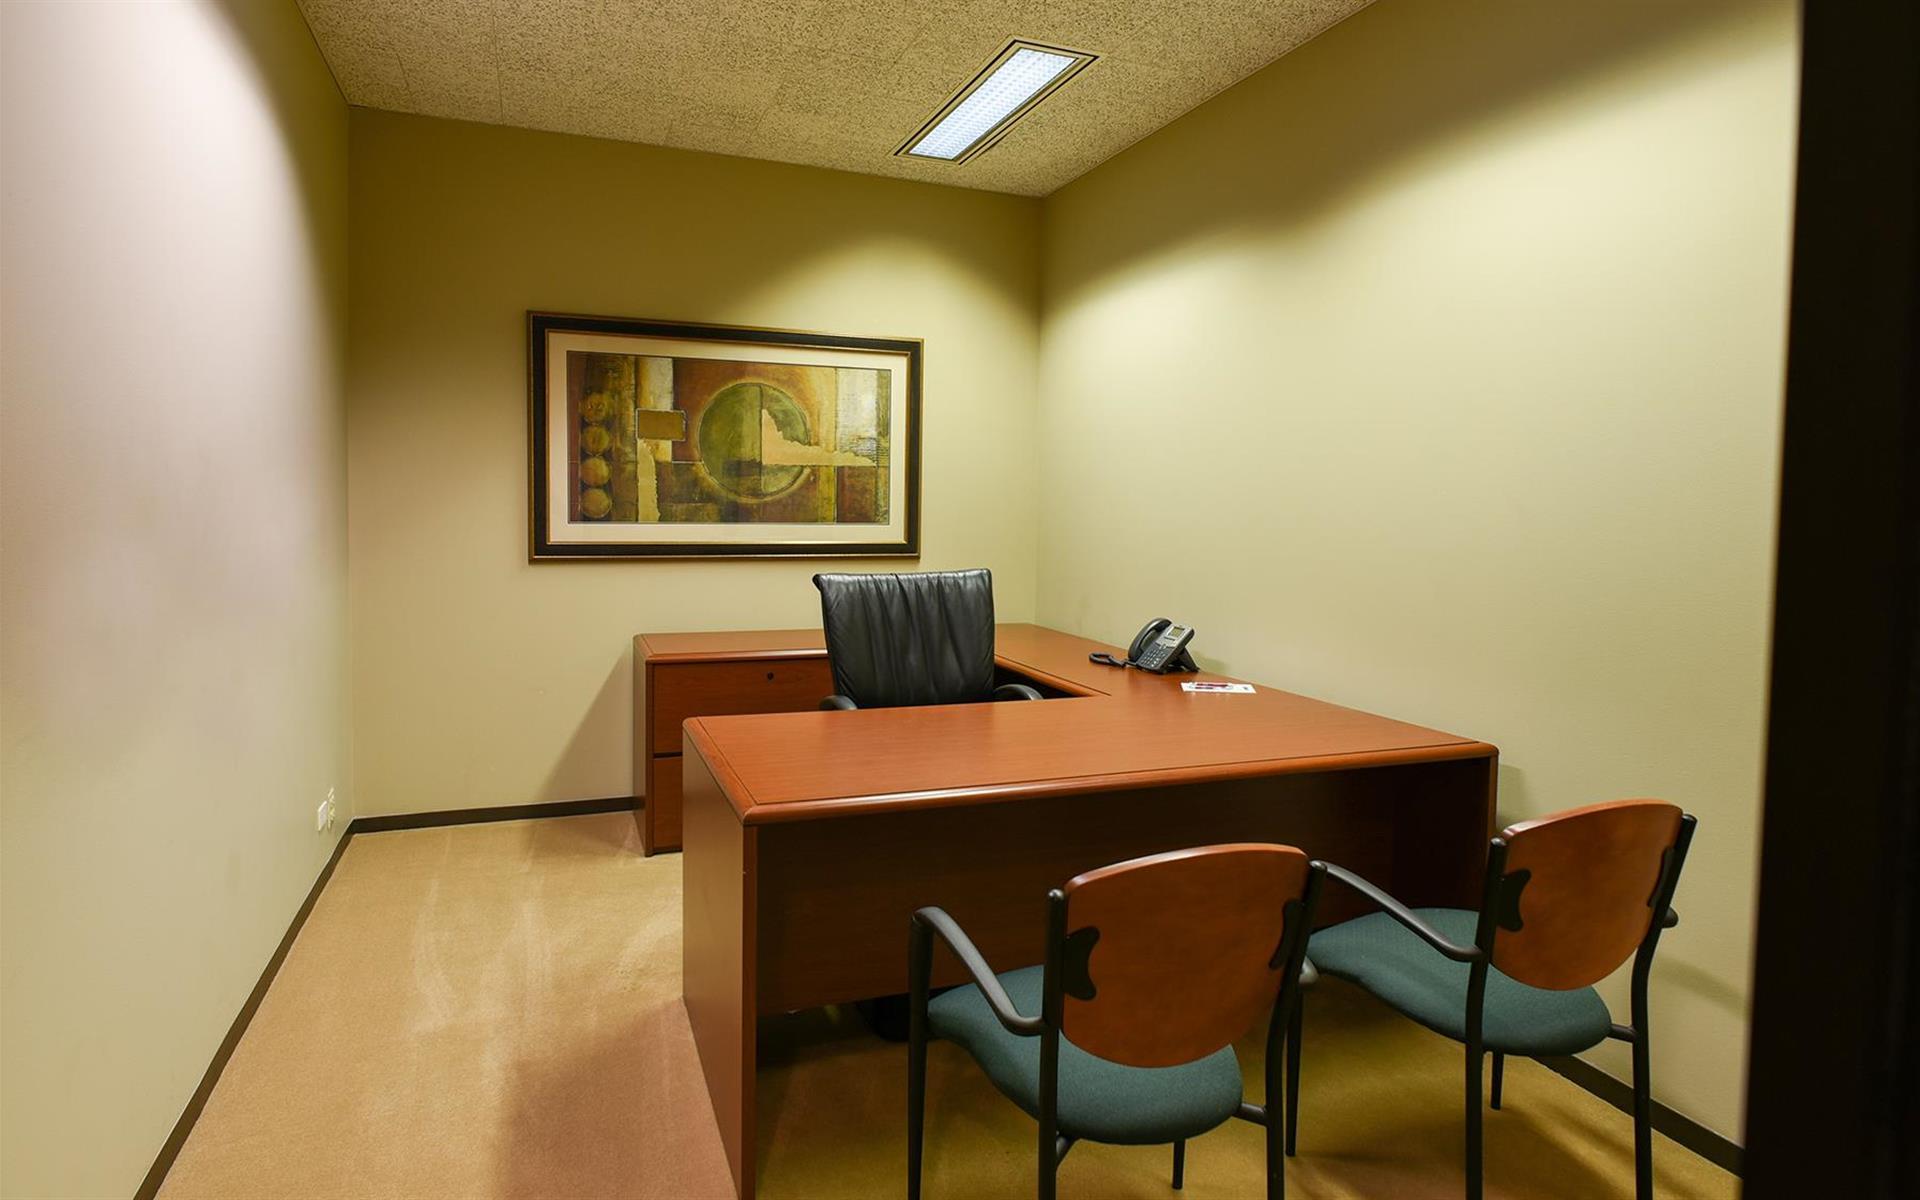 My Office Suite - Wacker Drive - Day Office 309